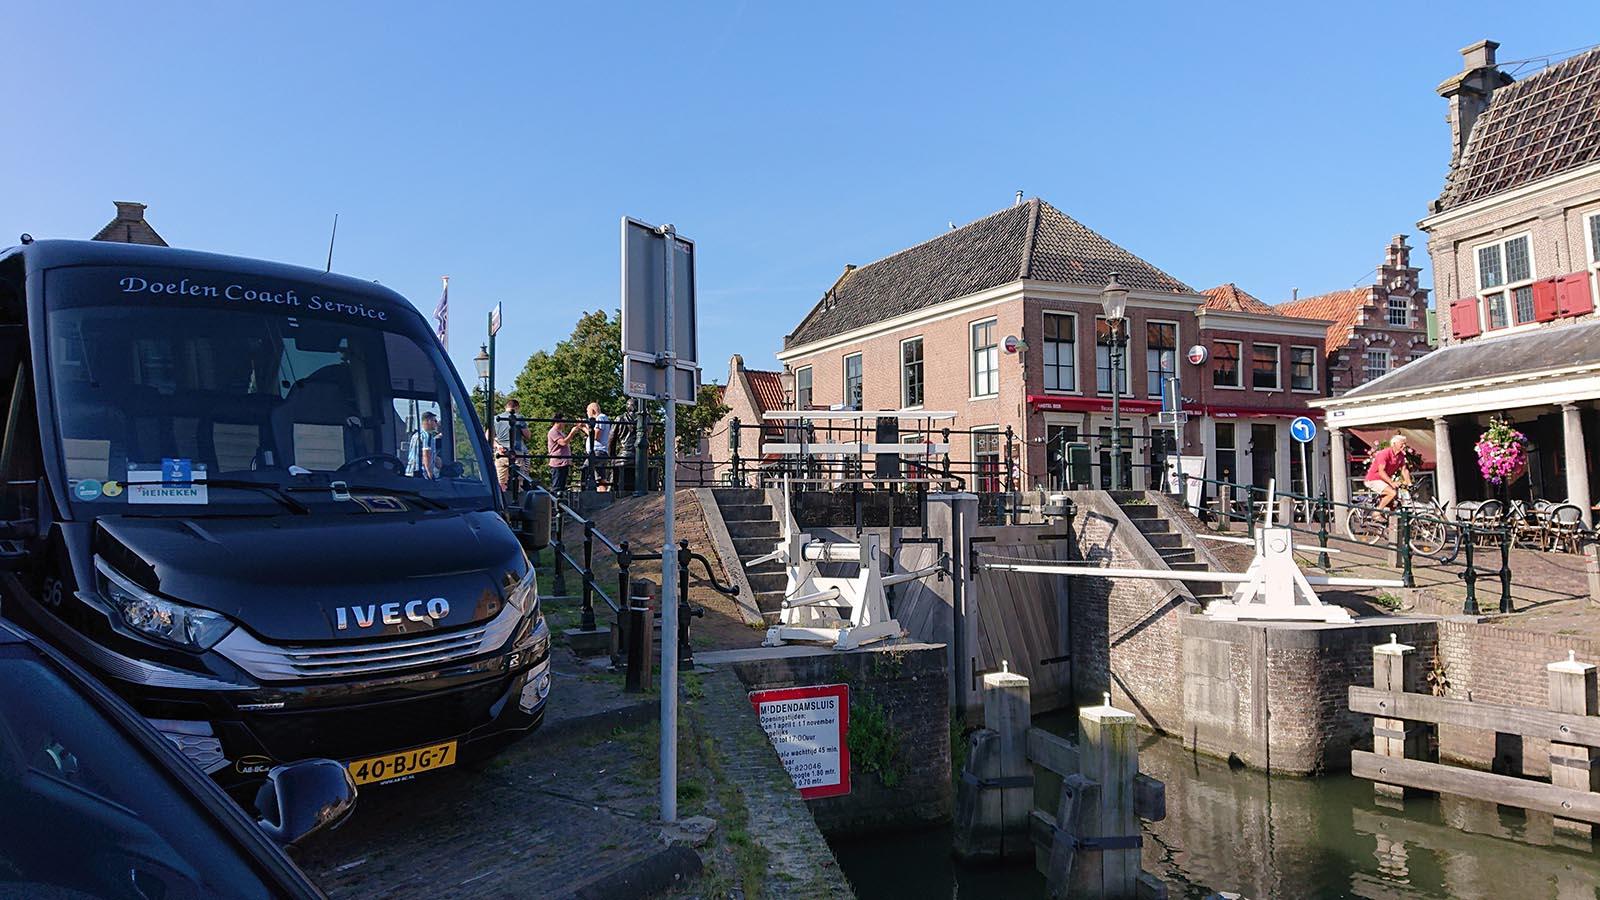 Iveco-Bus-Monnickendam